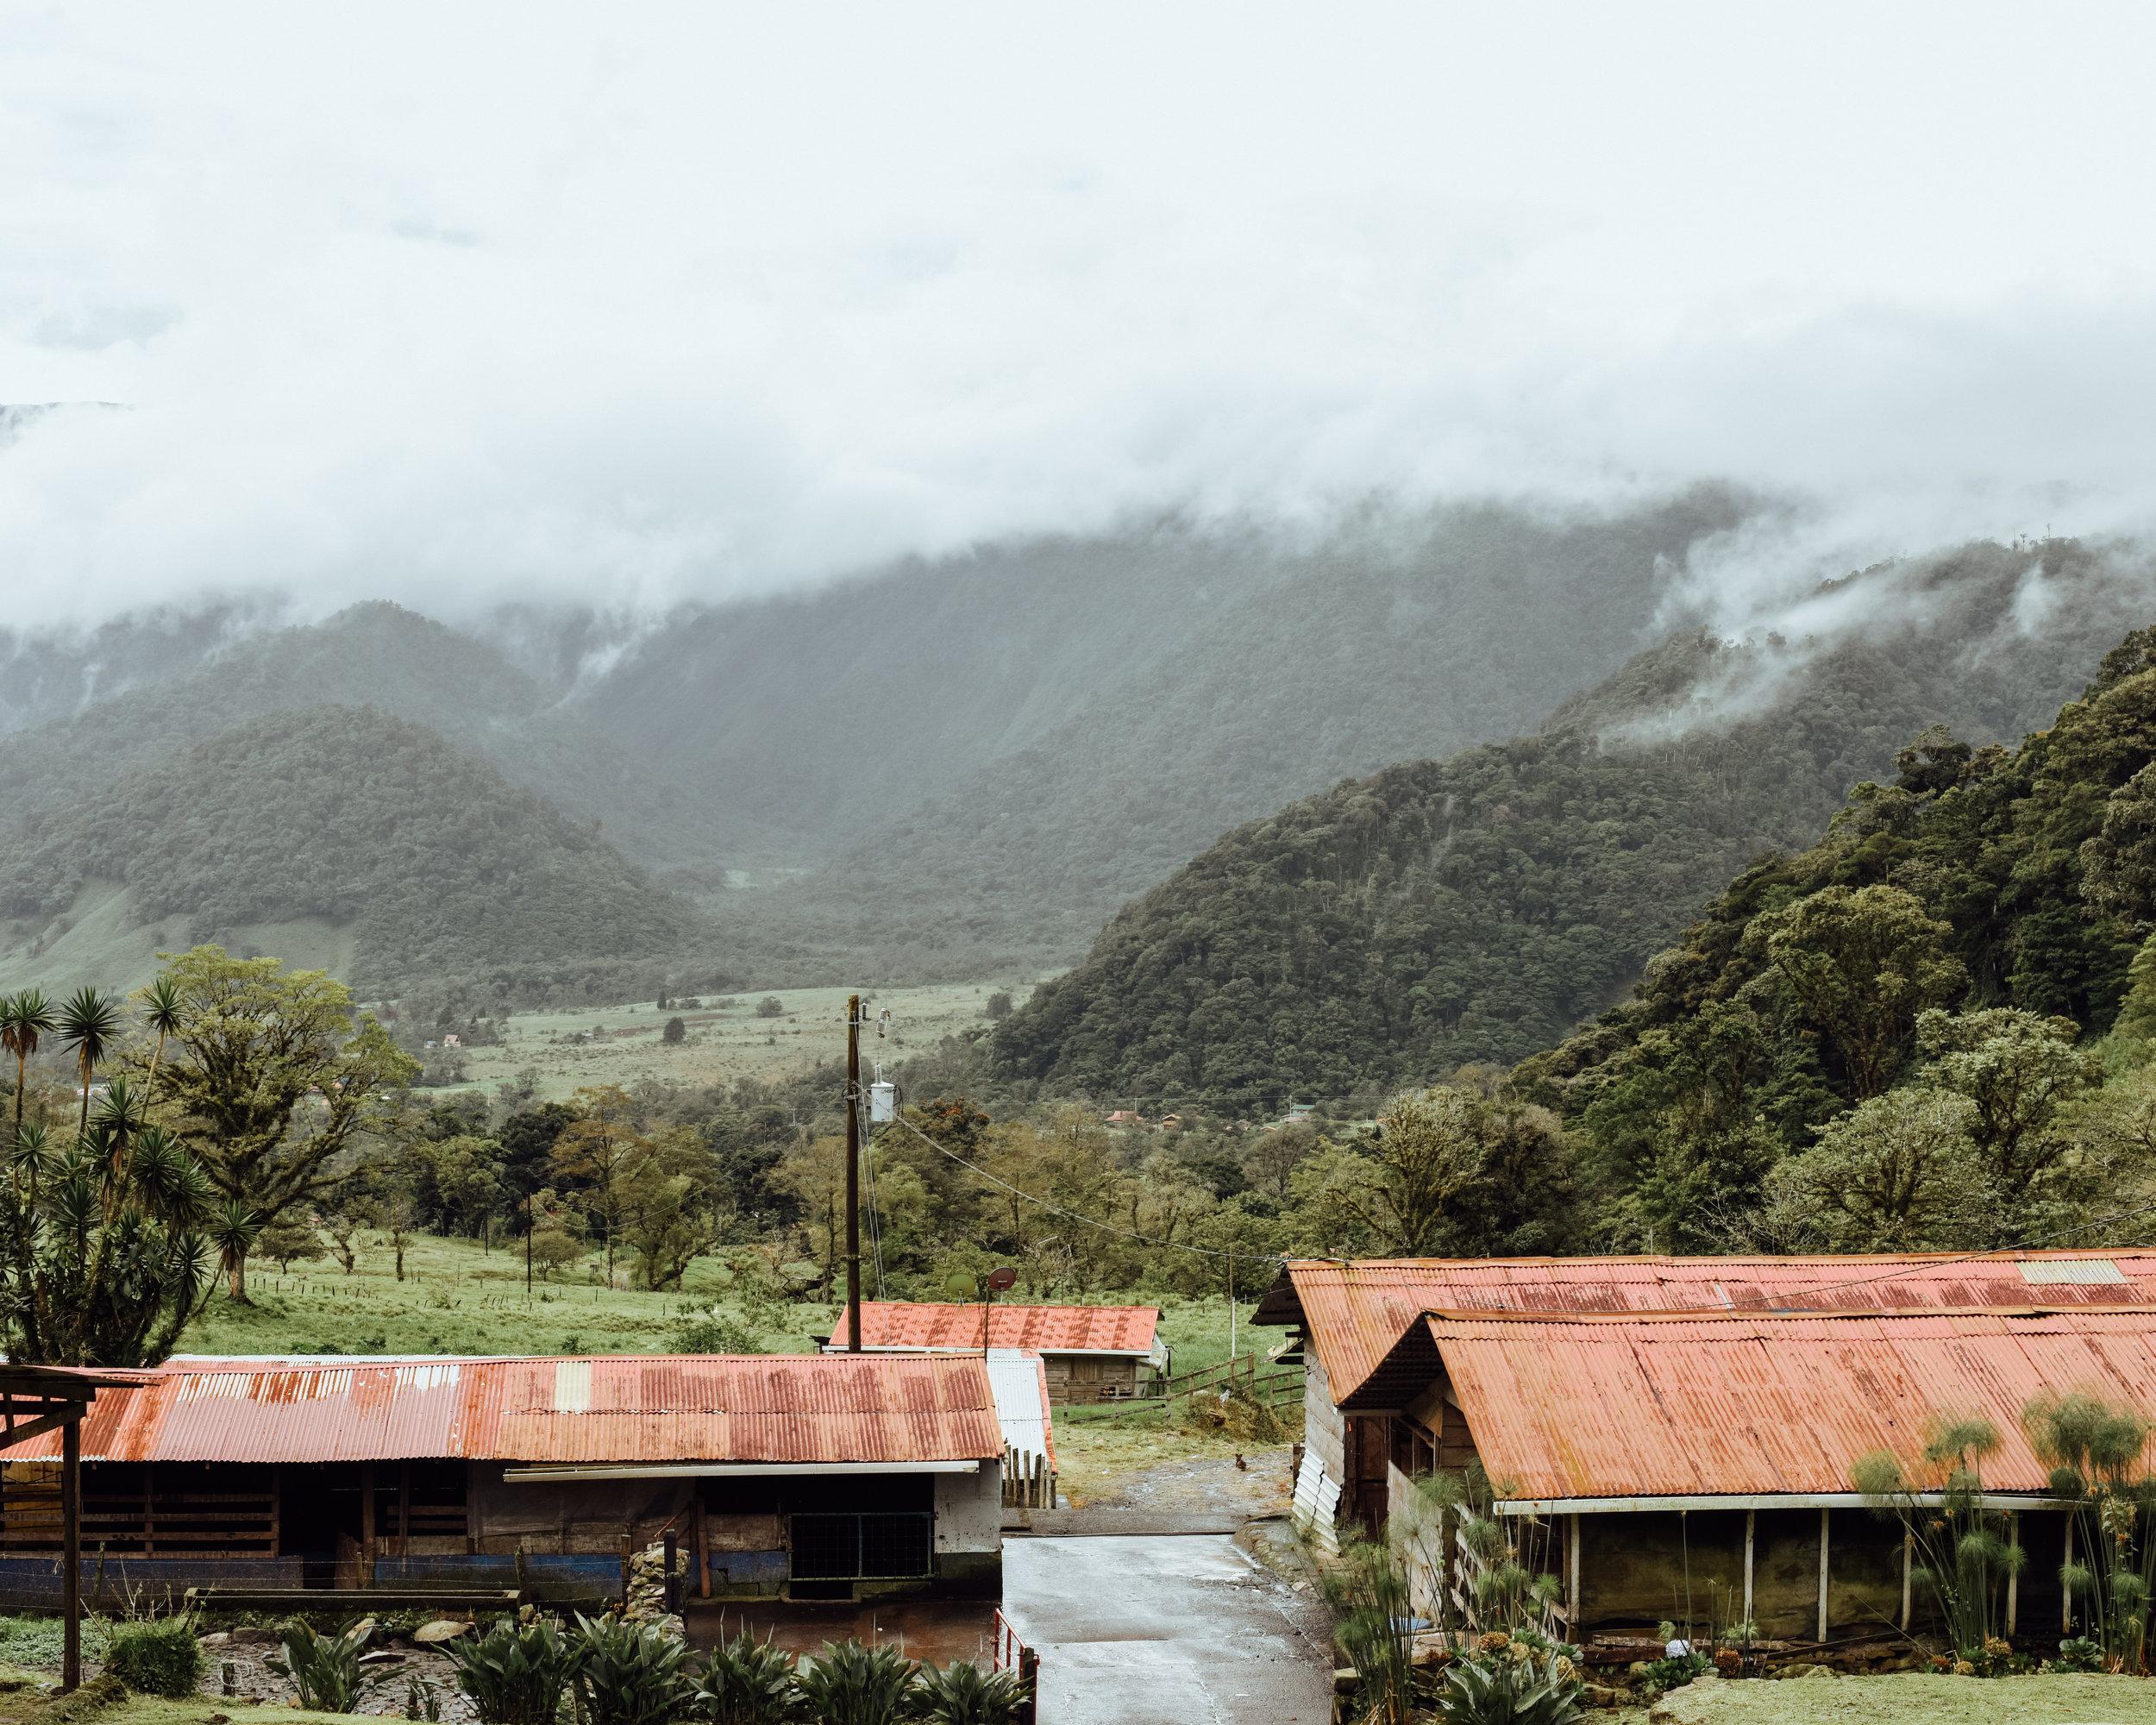 View from Aurora Lodge, Bajos del Toro